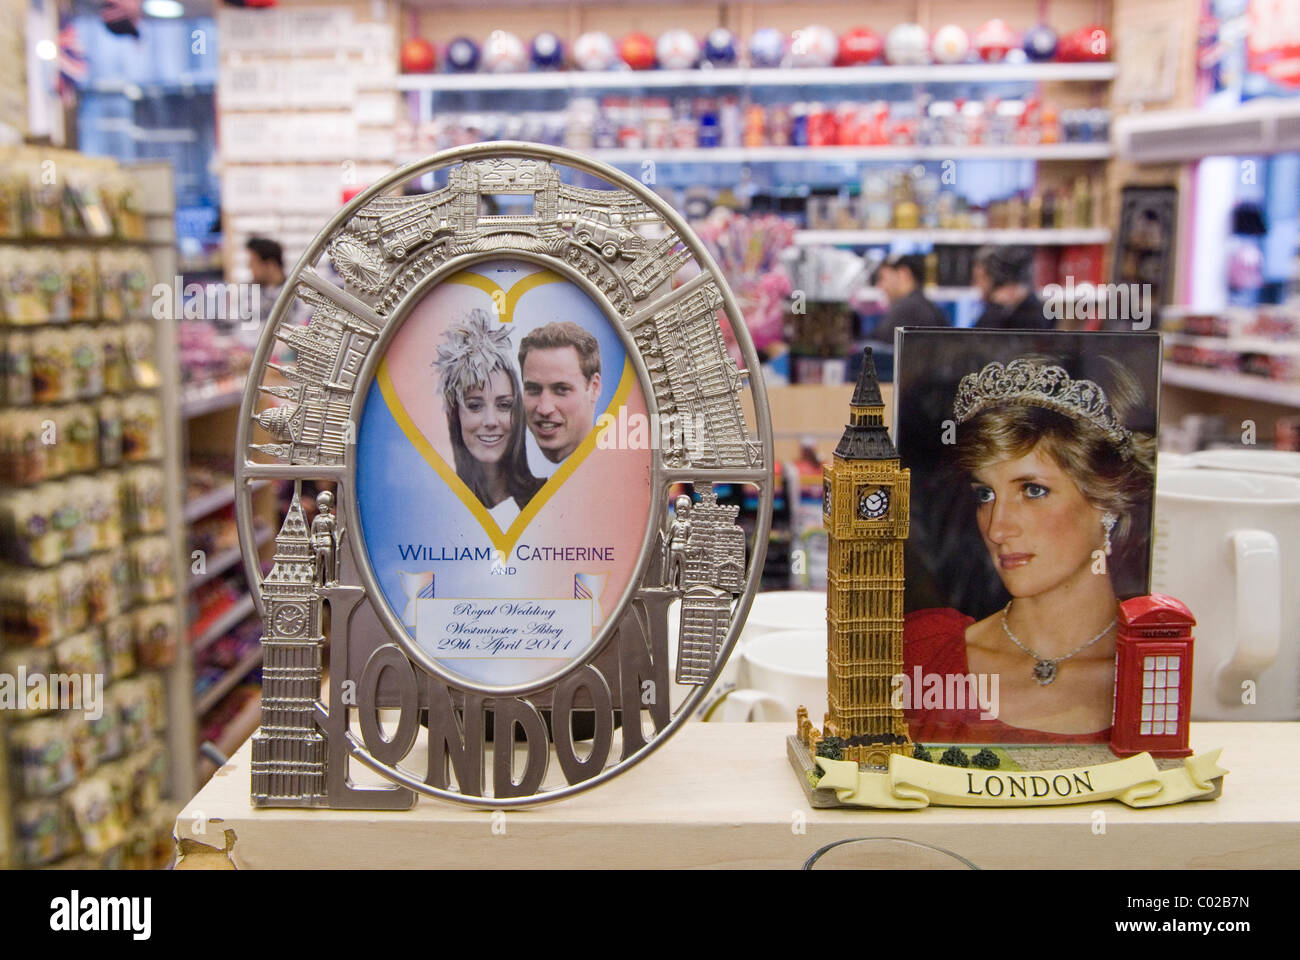 Prince William and Kate Middleton Royal Wedding memorabilia. London shop Princess Diana. - Stock Image